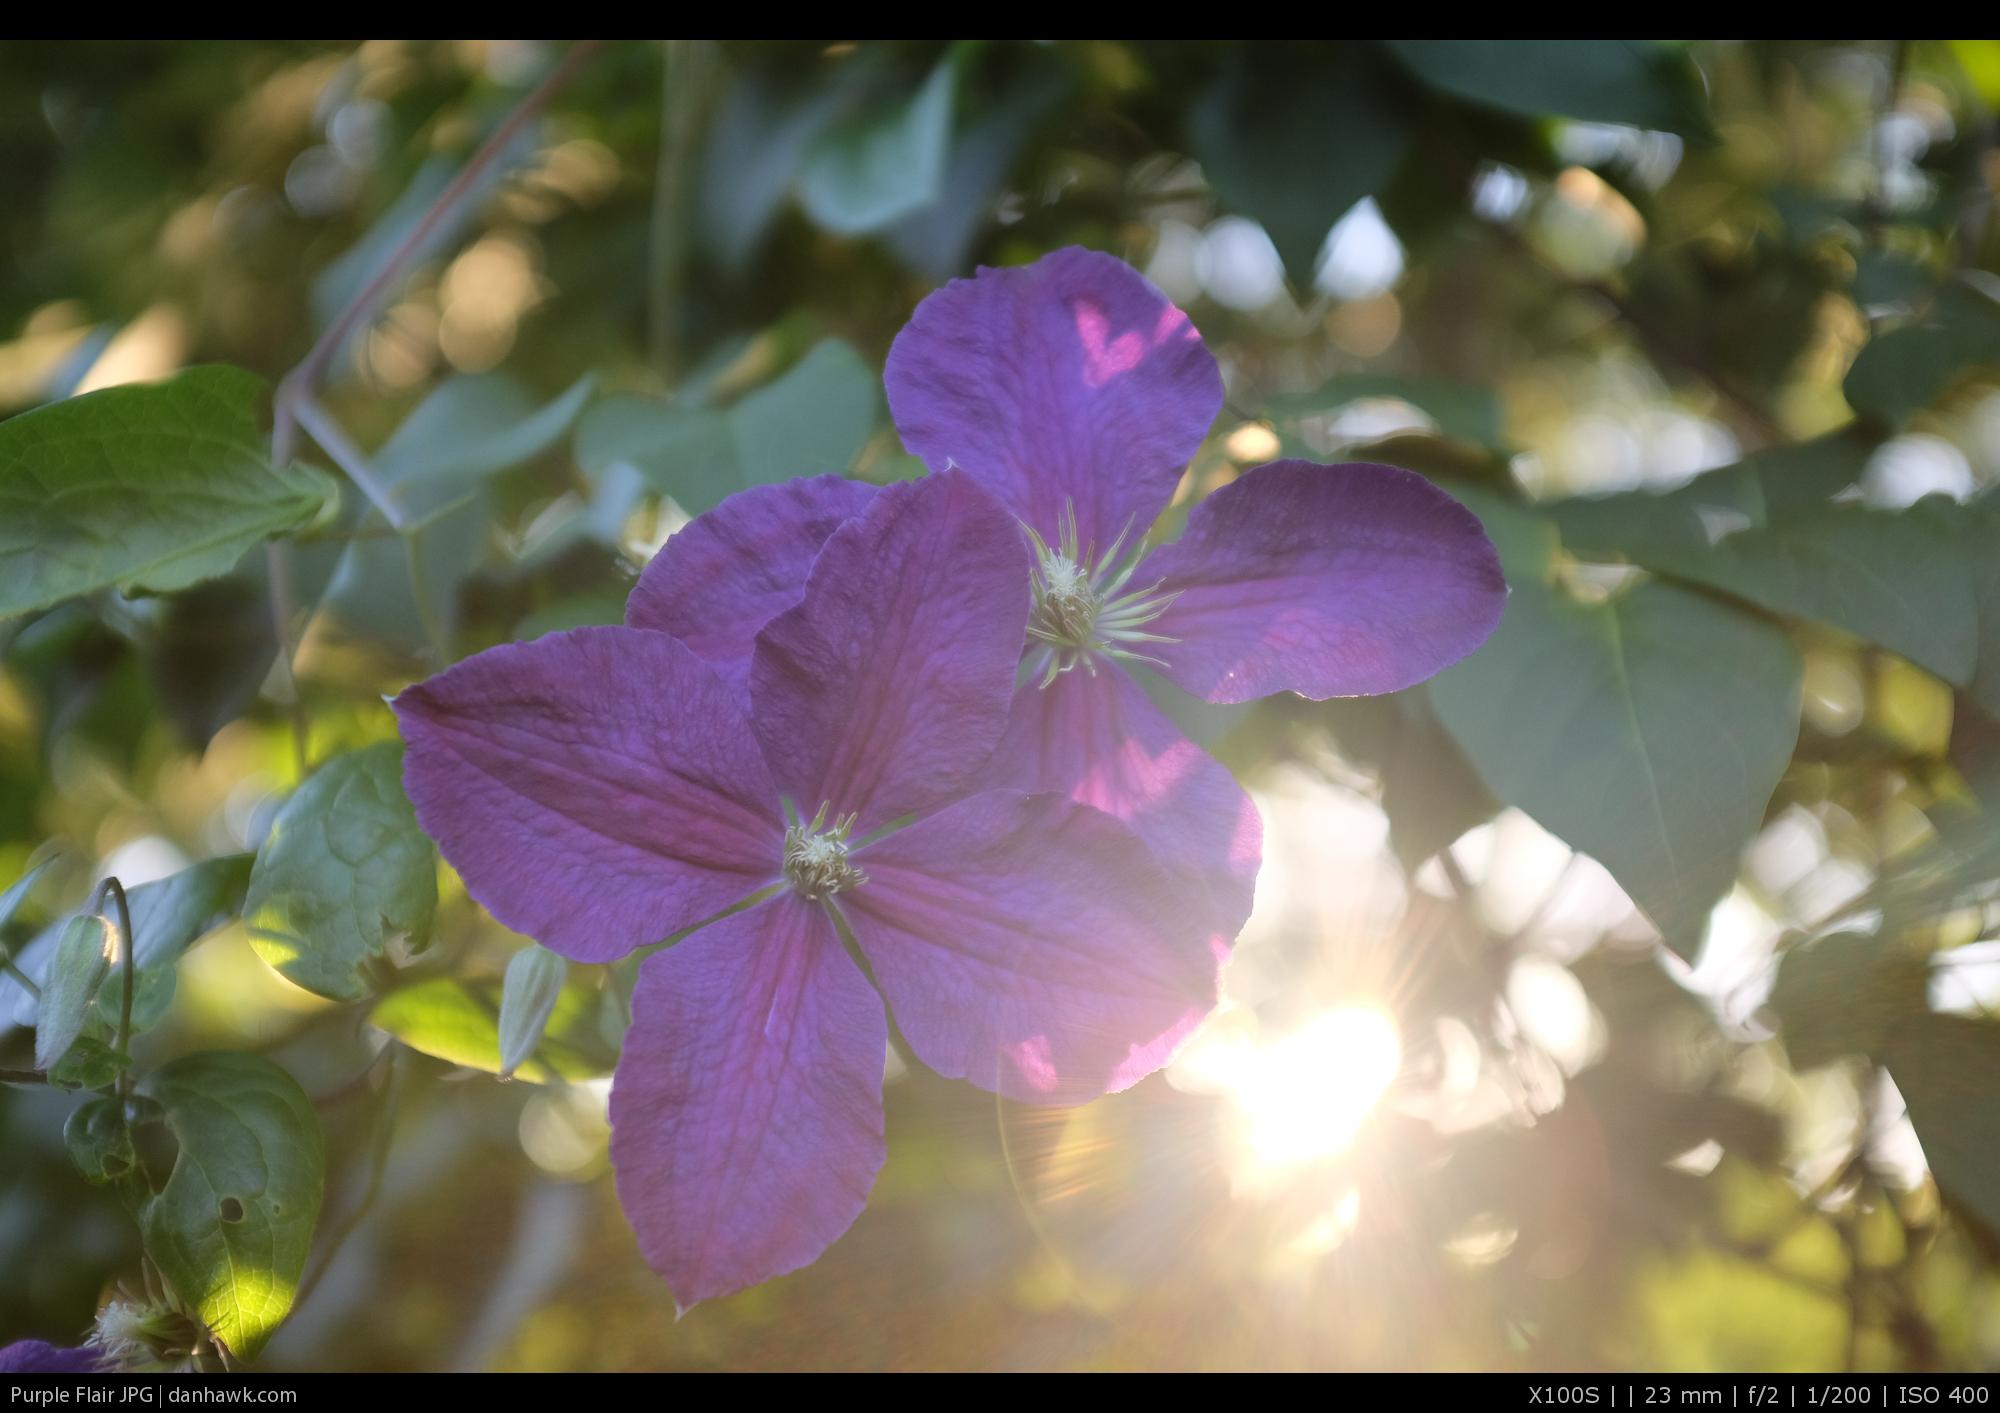 JPEG, Std Provia on Camera -no edits